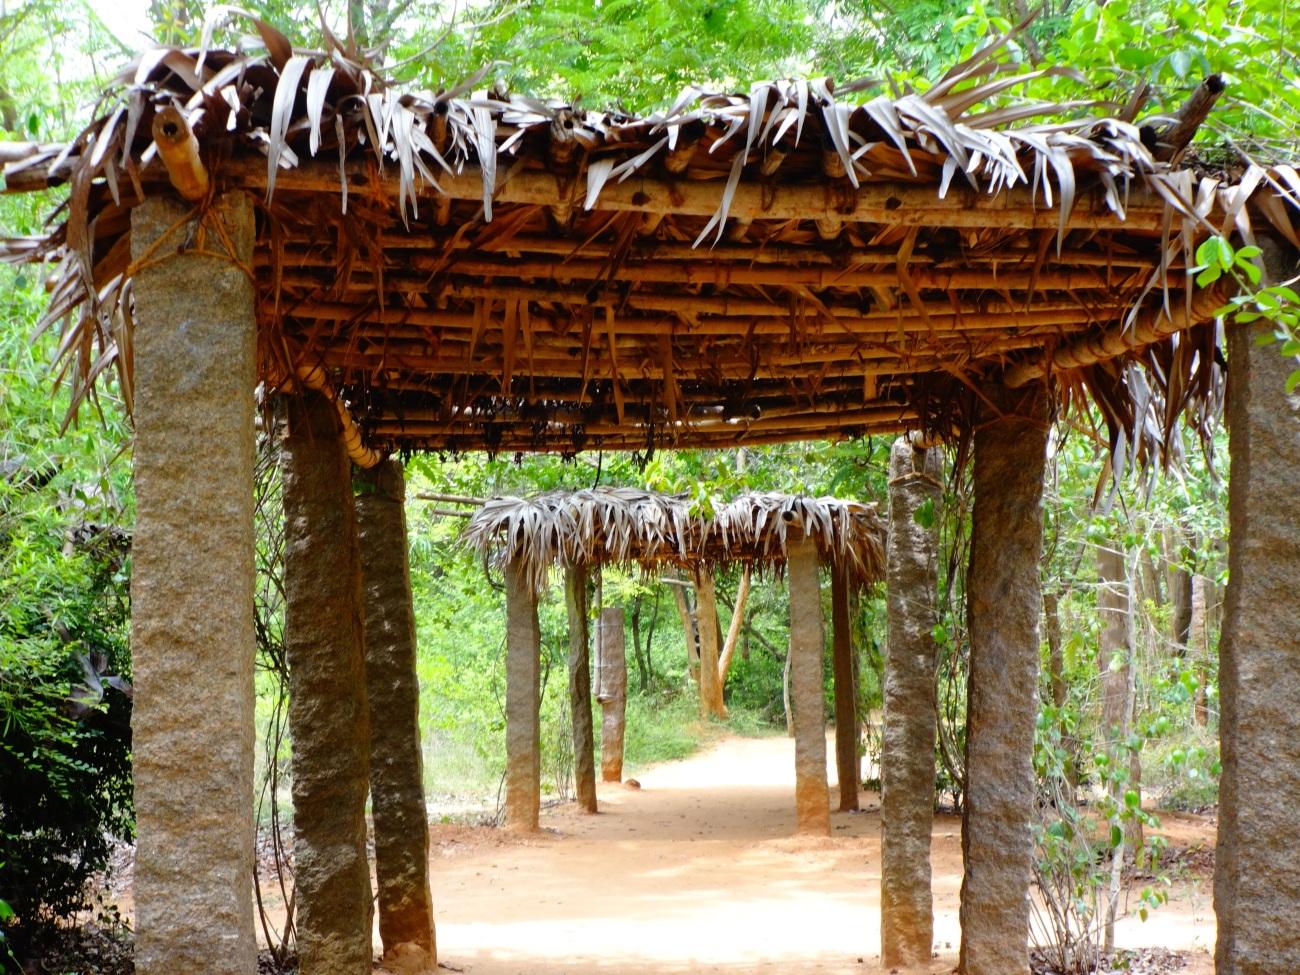 Walking path towards Matirmandir